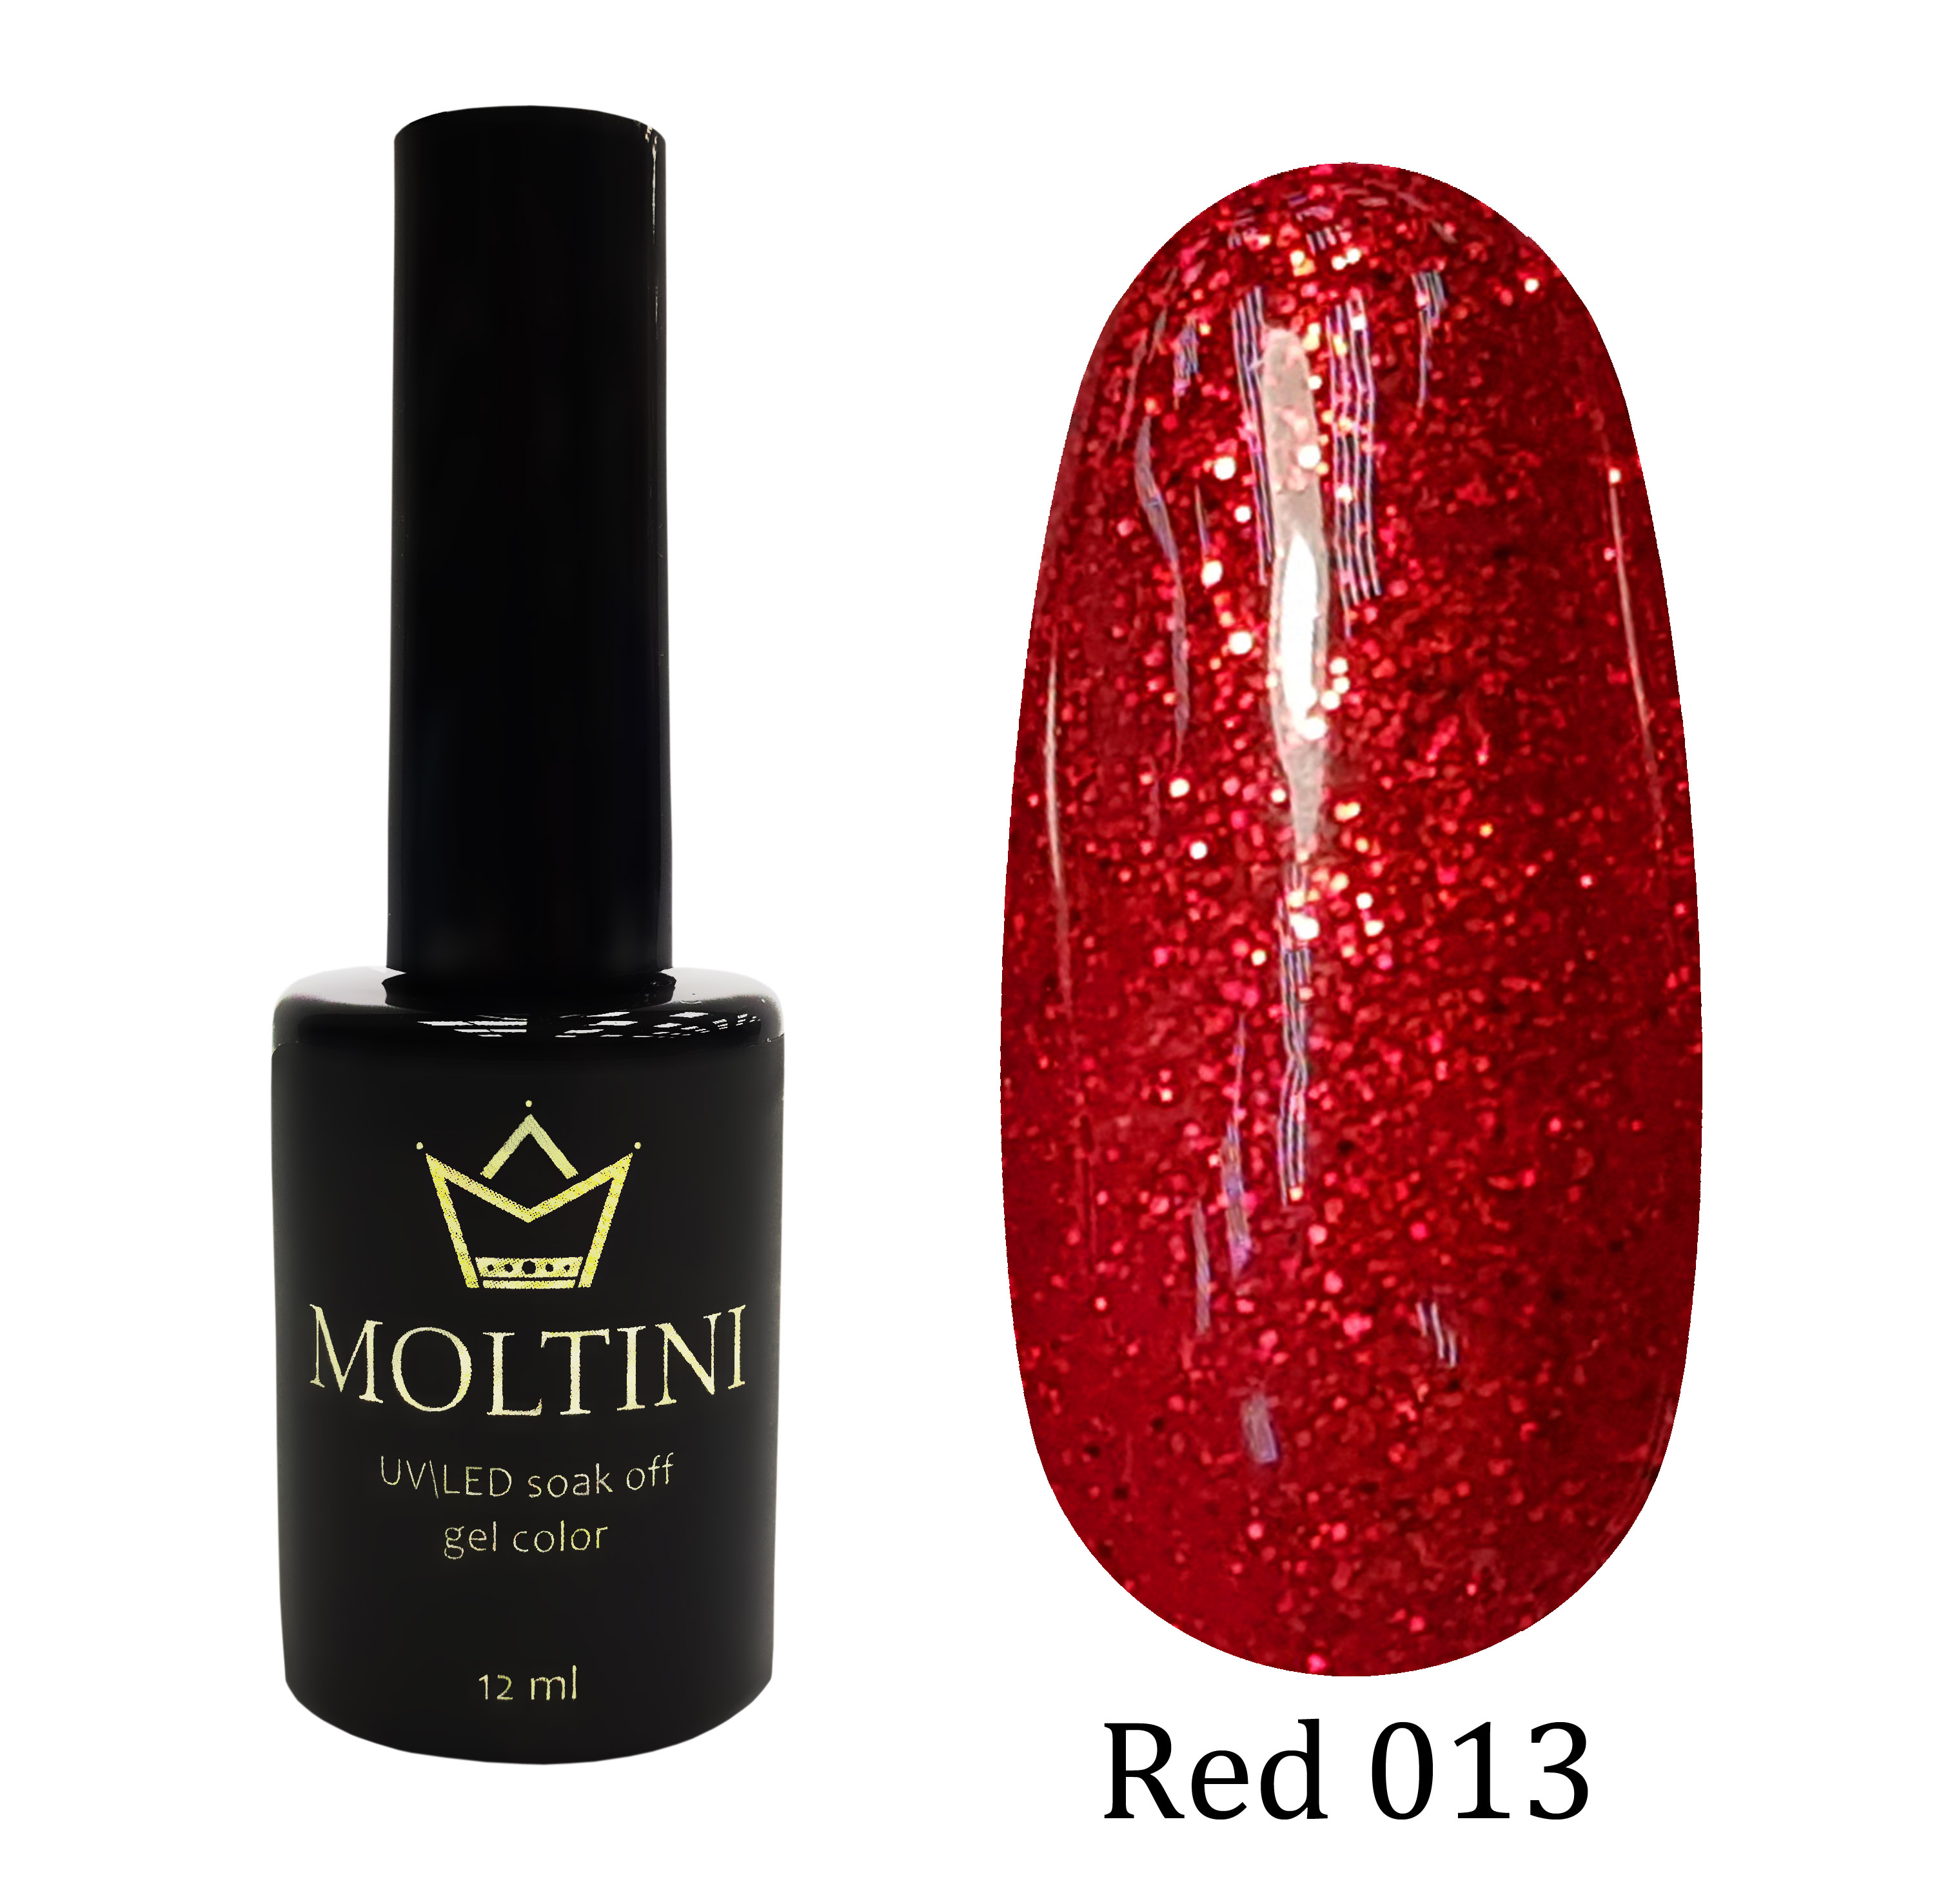 Гель-лак Moltini RED 013, 12 ml